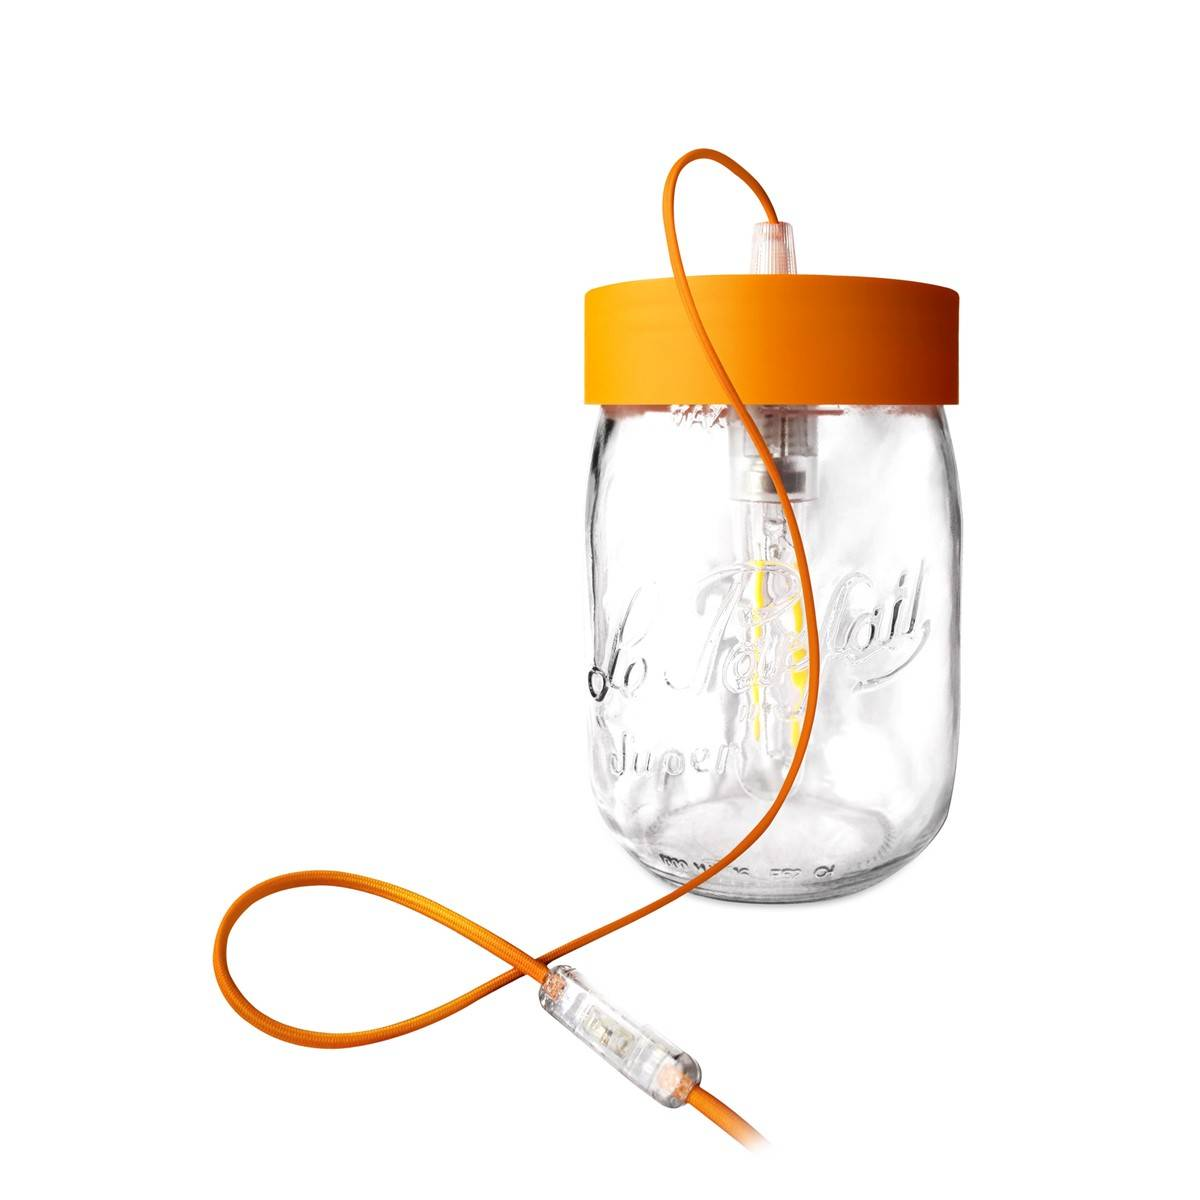 Fenel & Arno Lampe bocal en verre orange D20cm